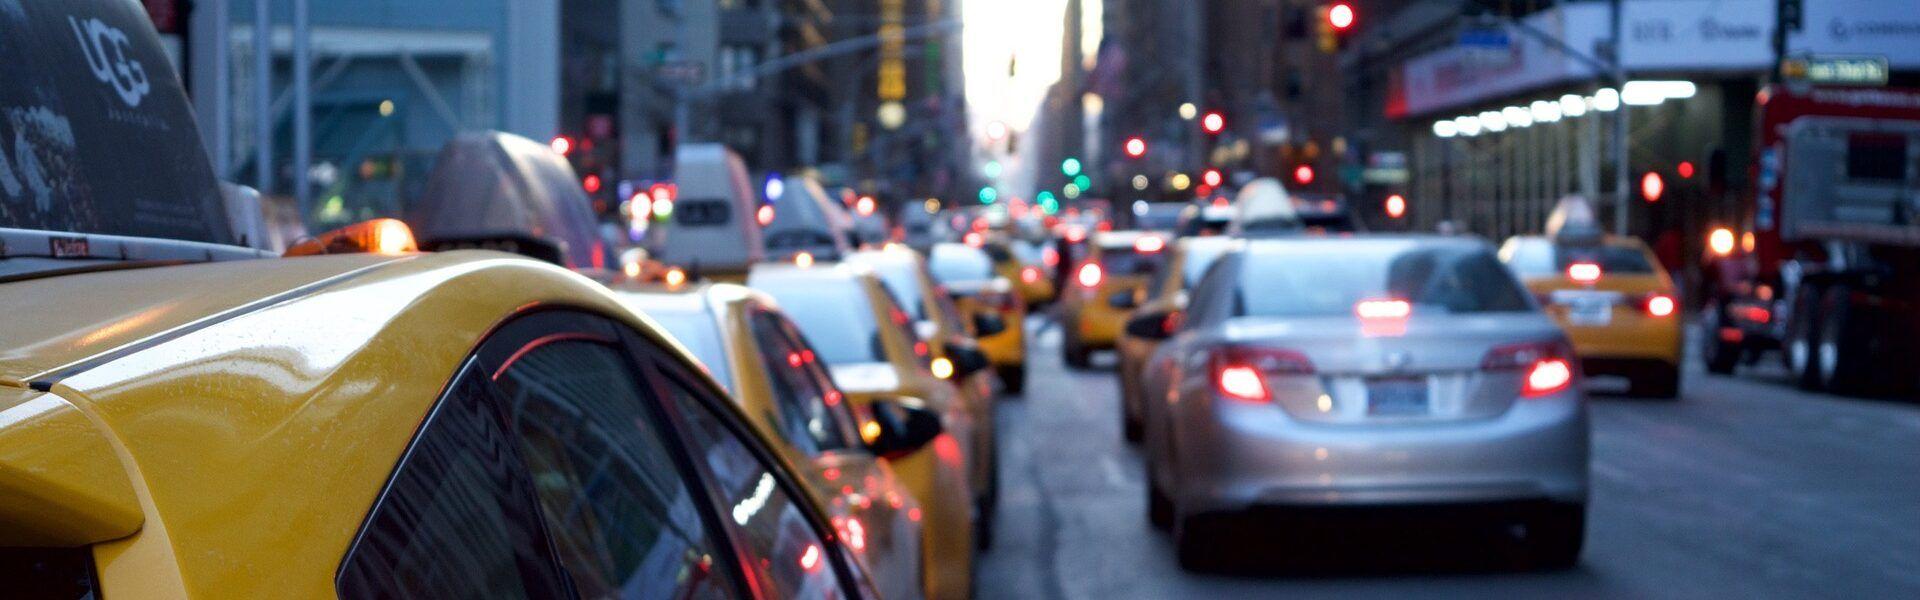 boton-start-stop-vehiculos